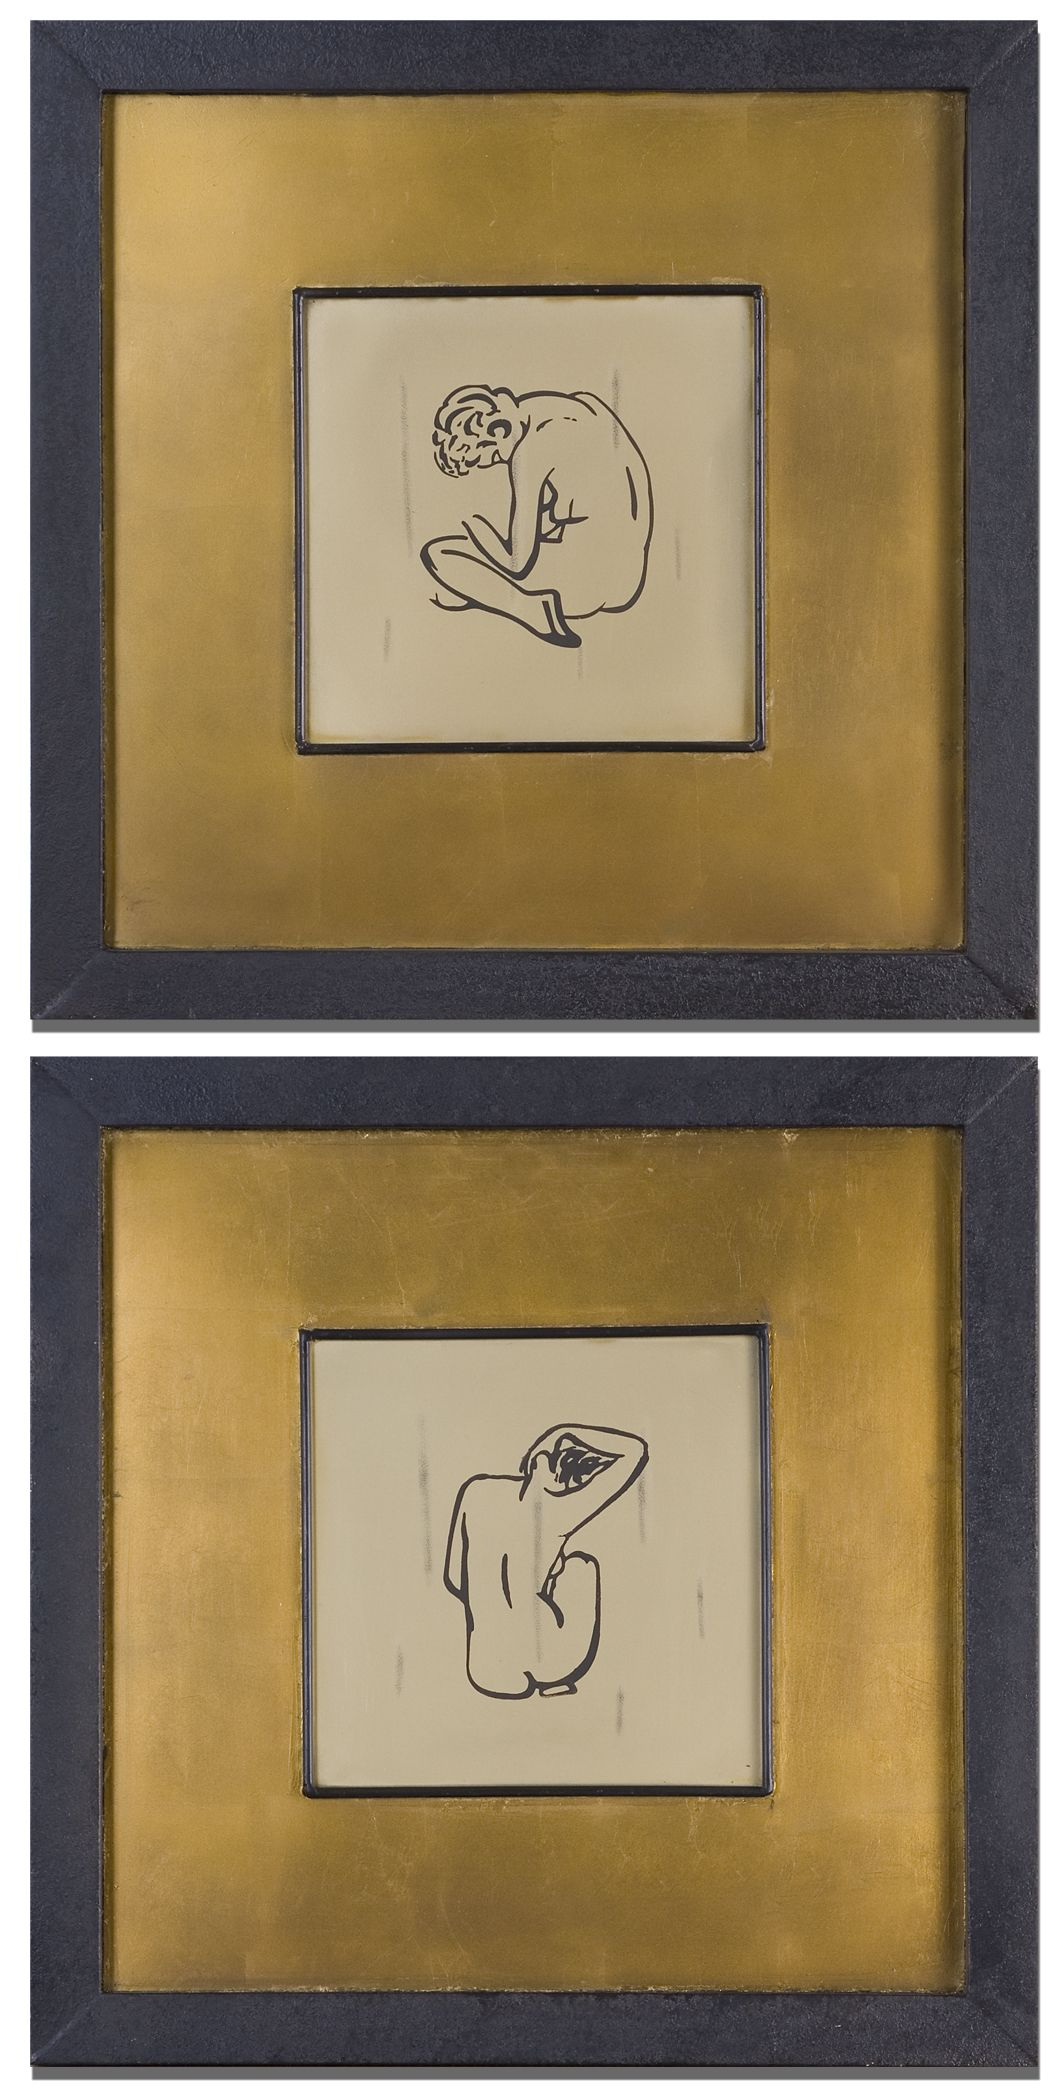 Nude + golden paspartu + black frame | Home Accessories | Pinterest ...